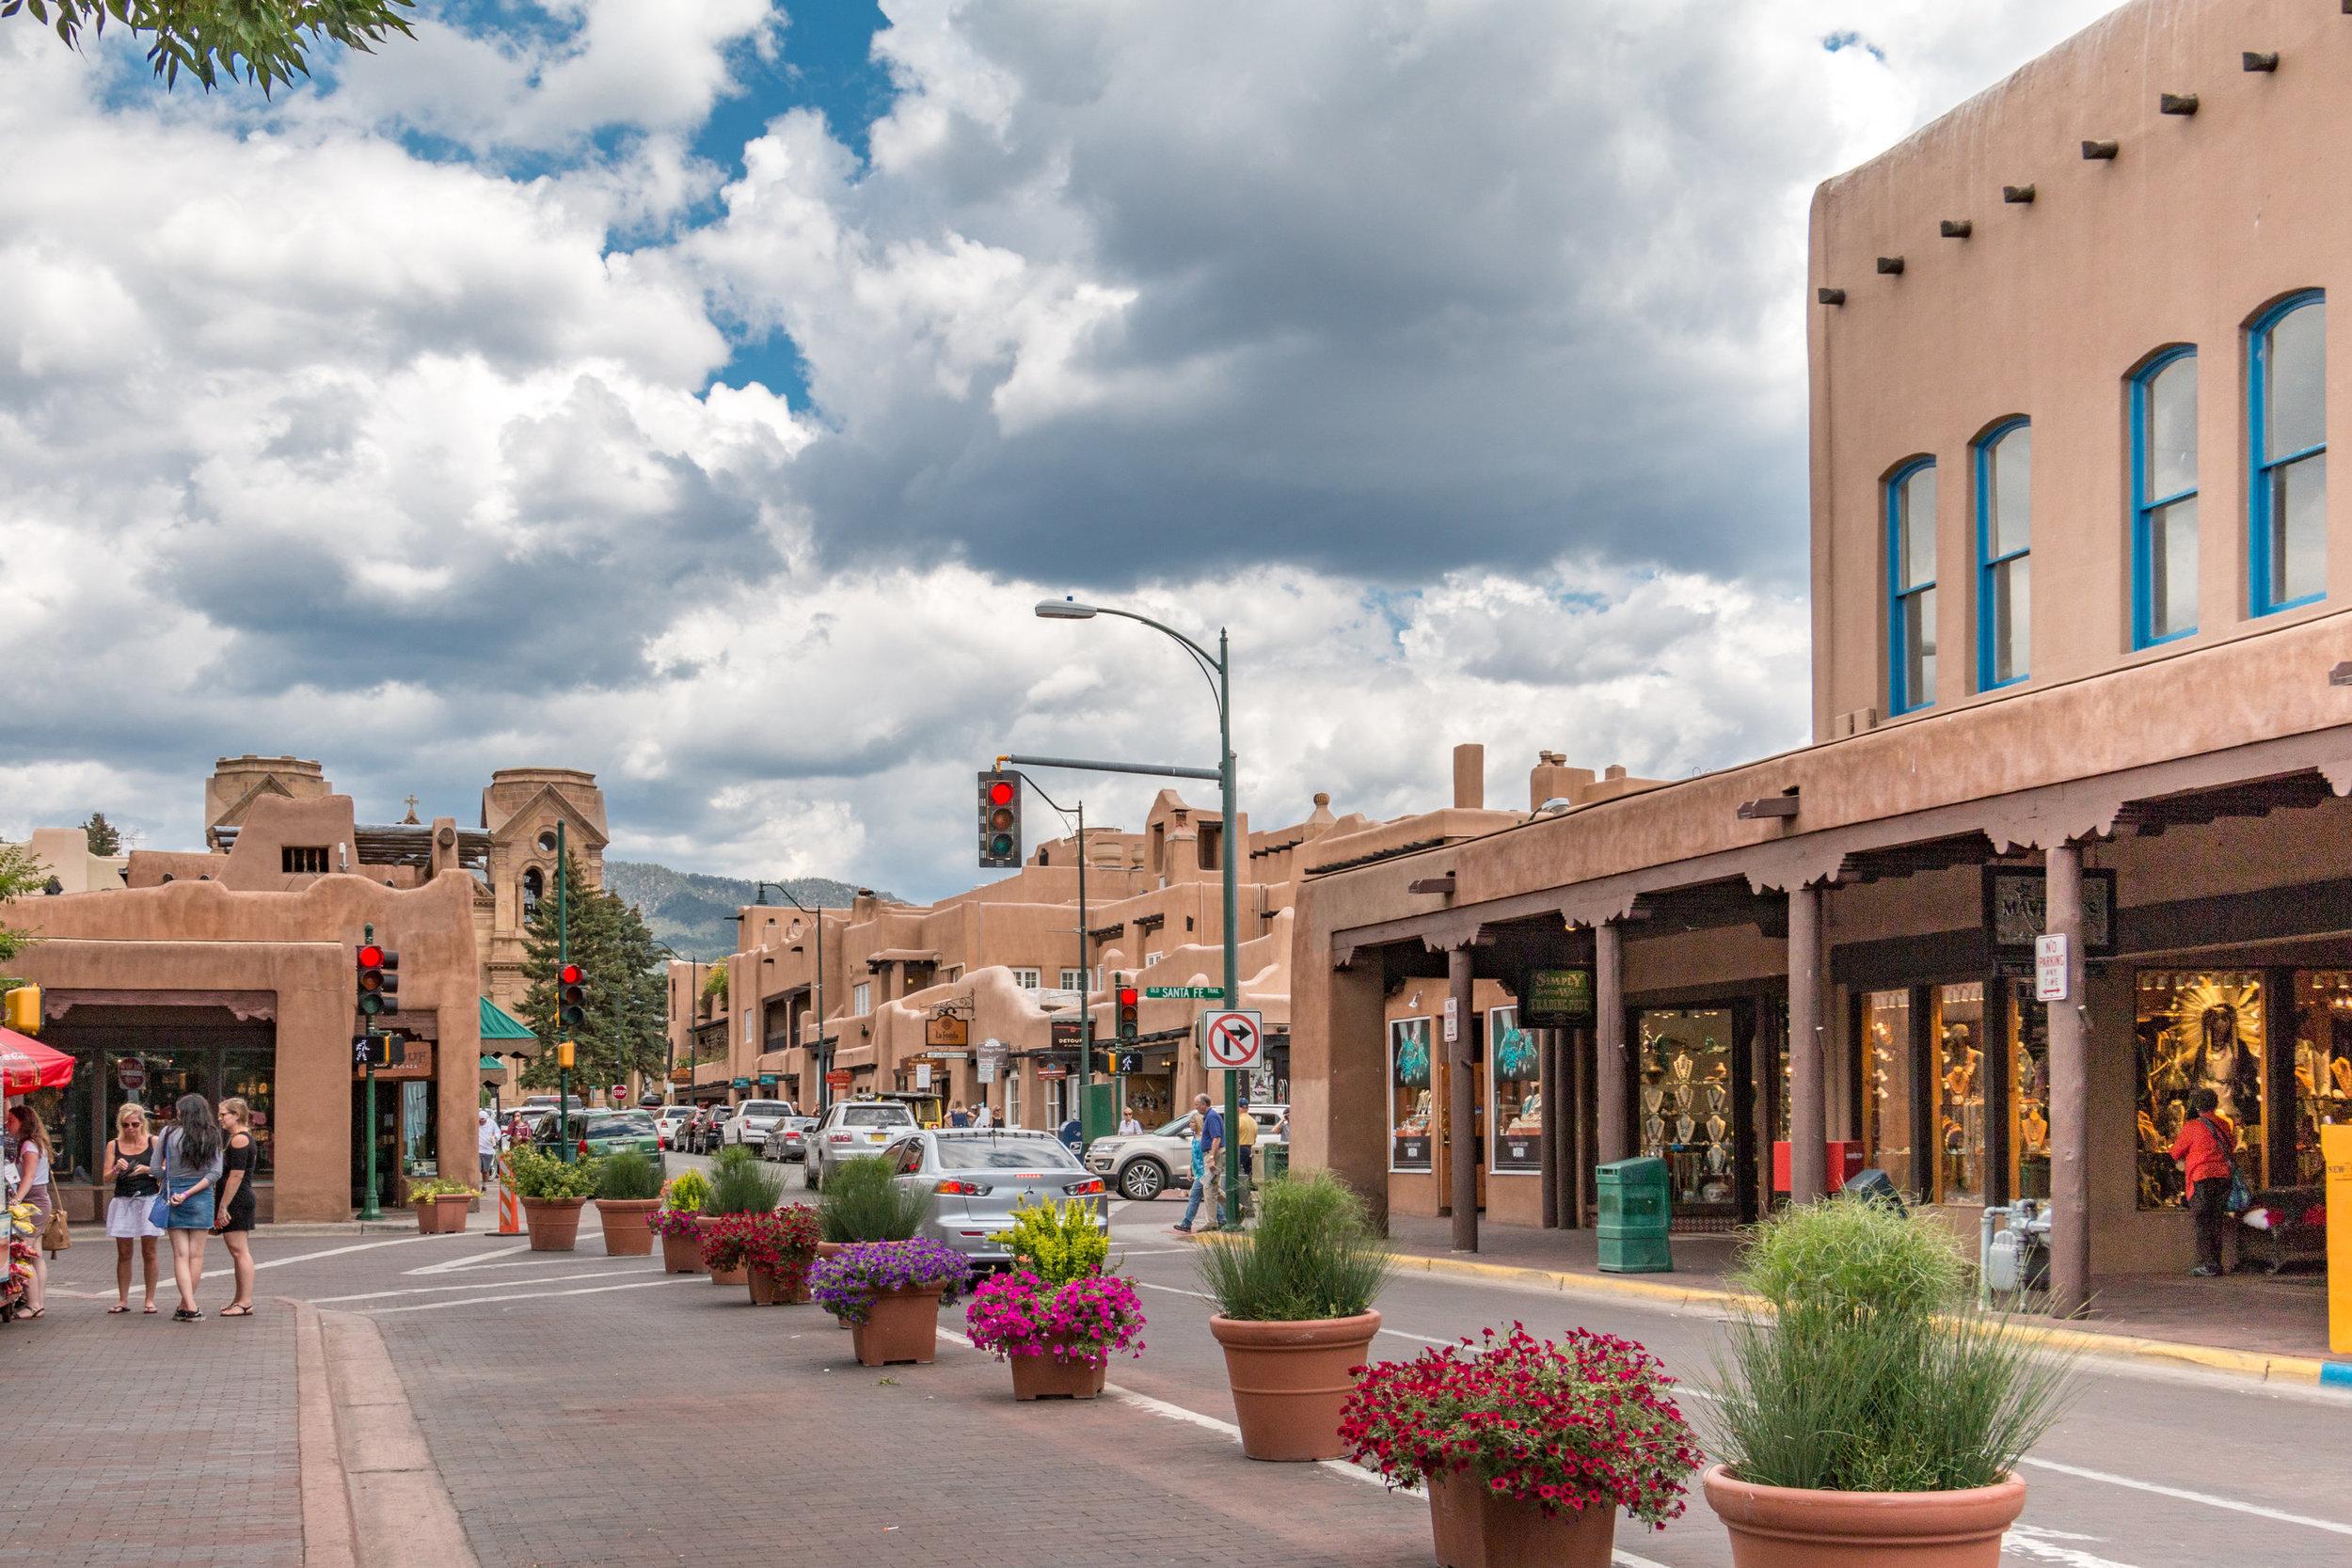 Colorful, beautiful downtown Santa Fe